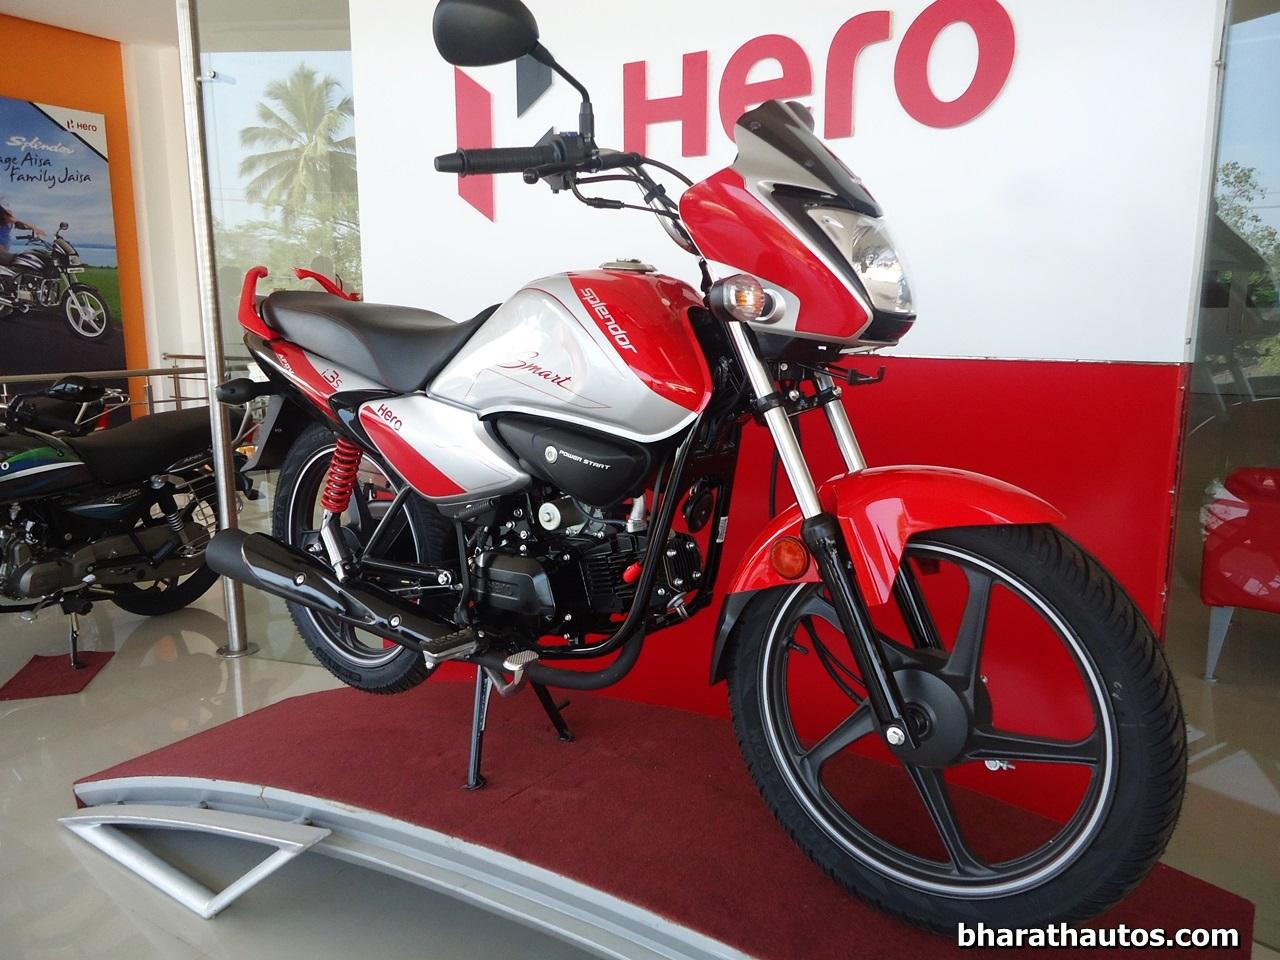 Hero Honda Motorcycle Price